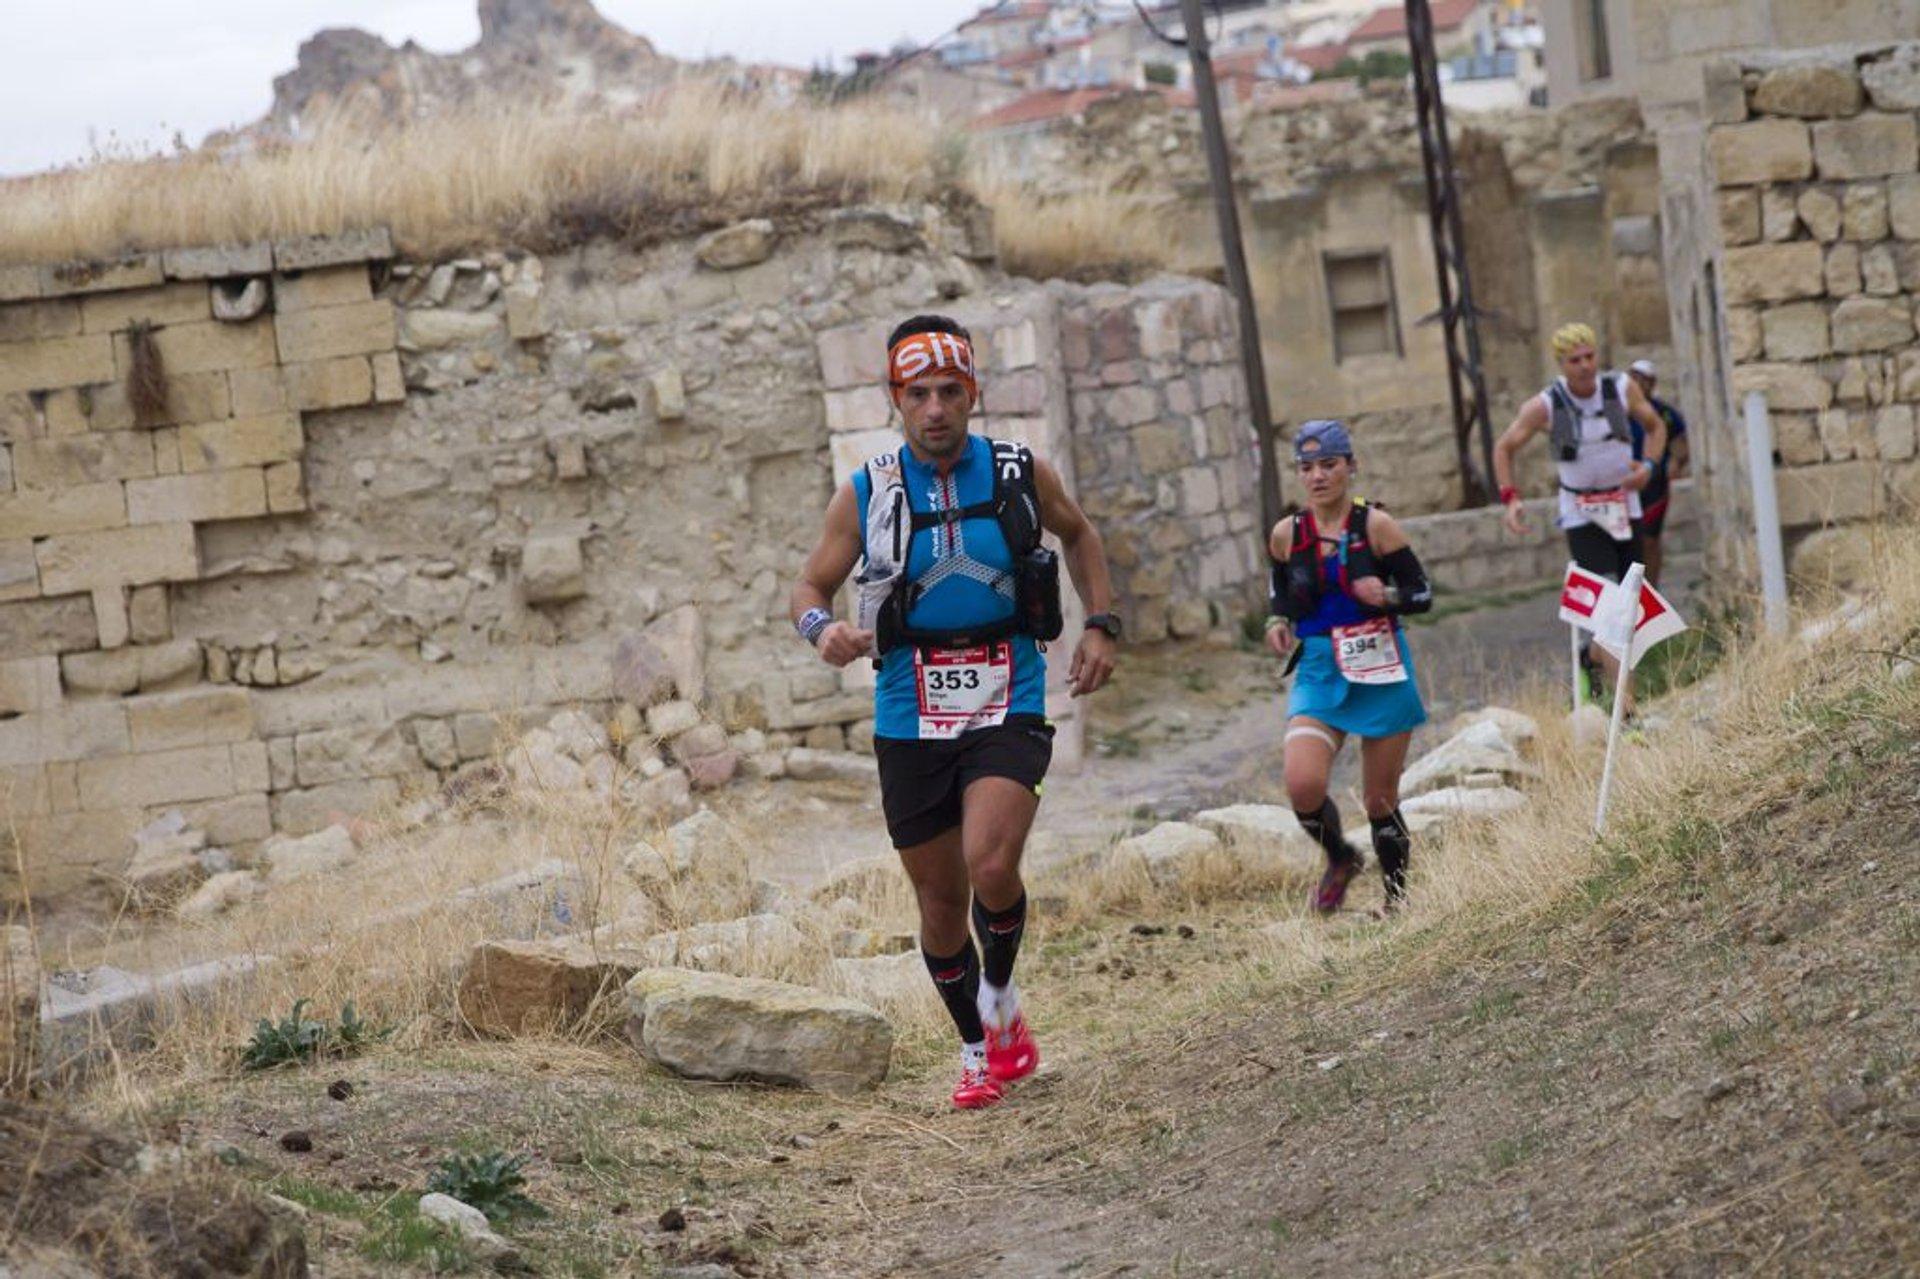 Best time for Cappadocia Ultra Trail in Cappadocia 2020